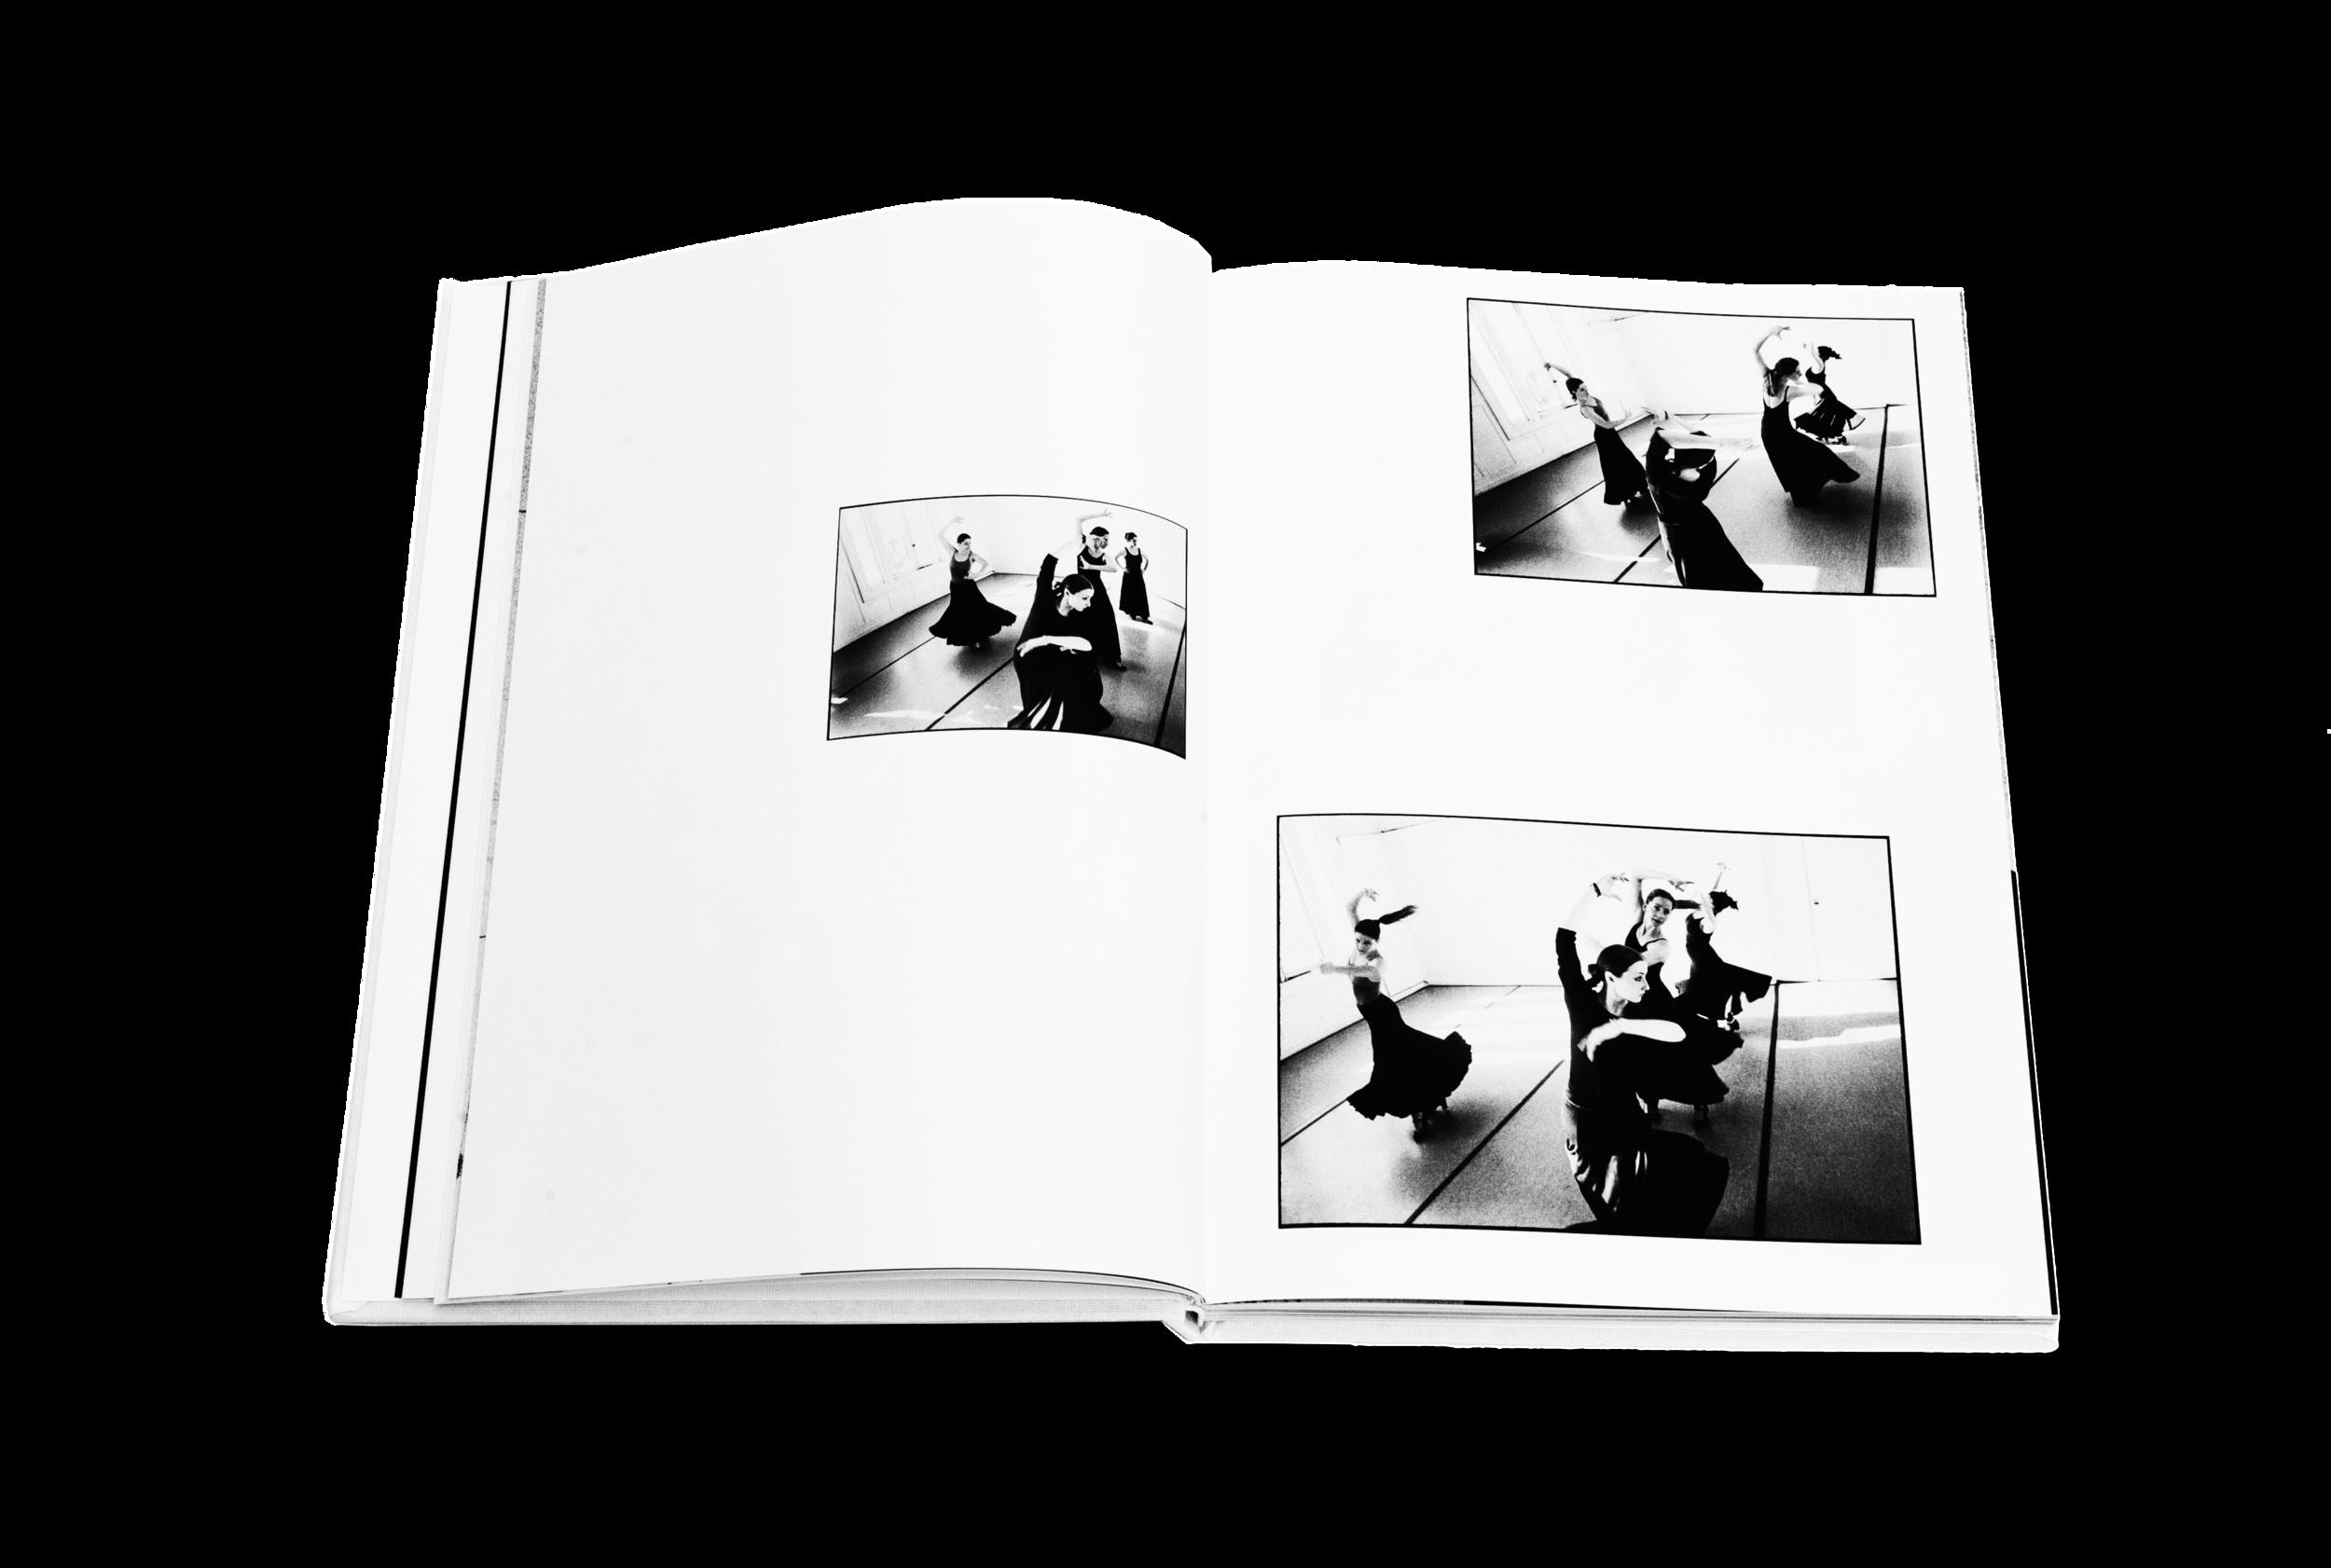 Books_Flamenco_3.png